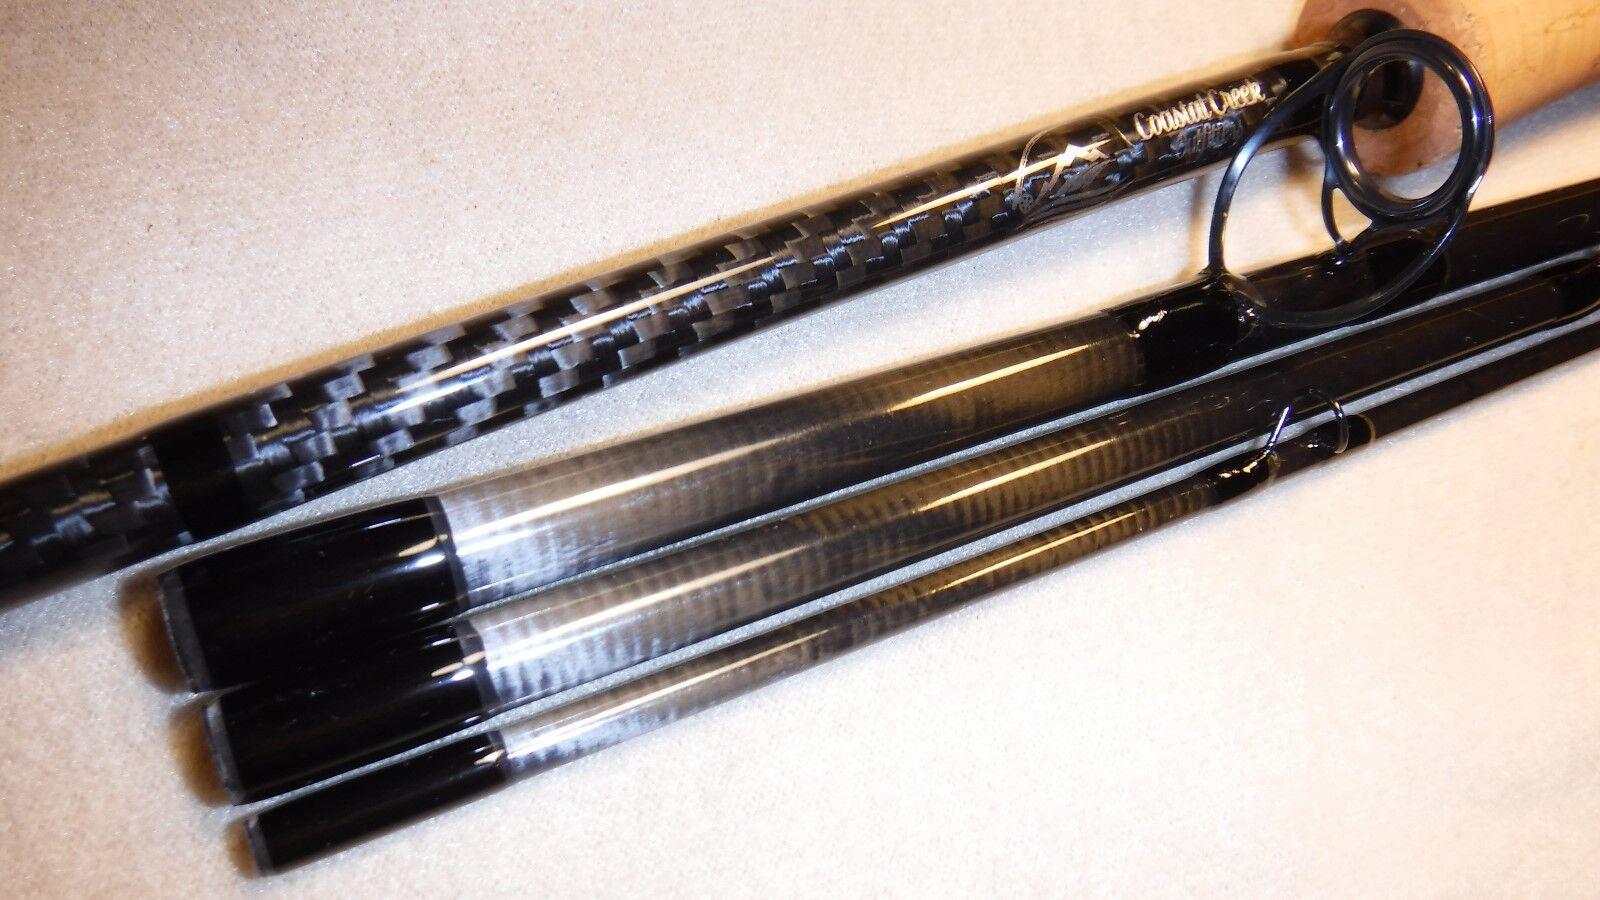 Matriz 8wt 9' Fly Rod costumbre construido para ti por Coastal Creek Outfitters